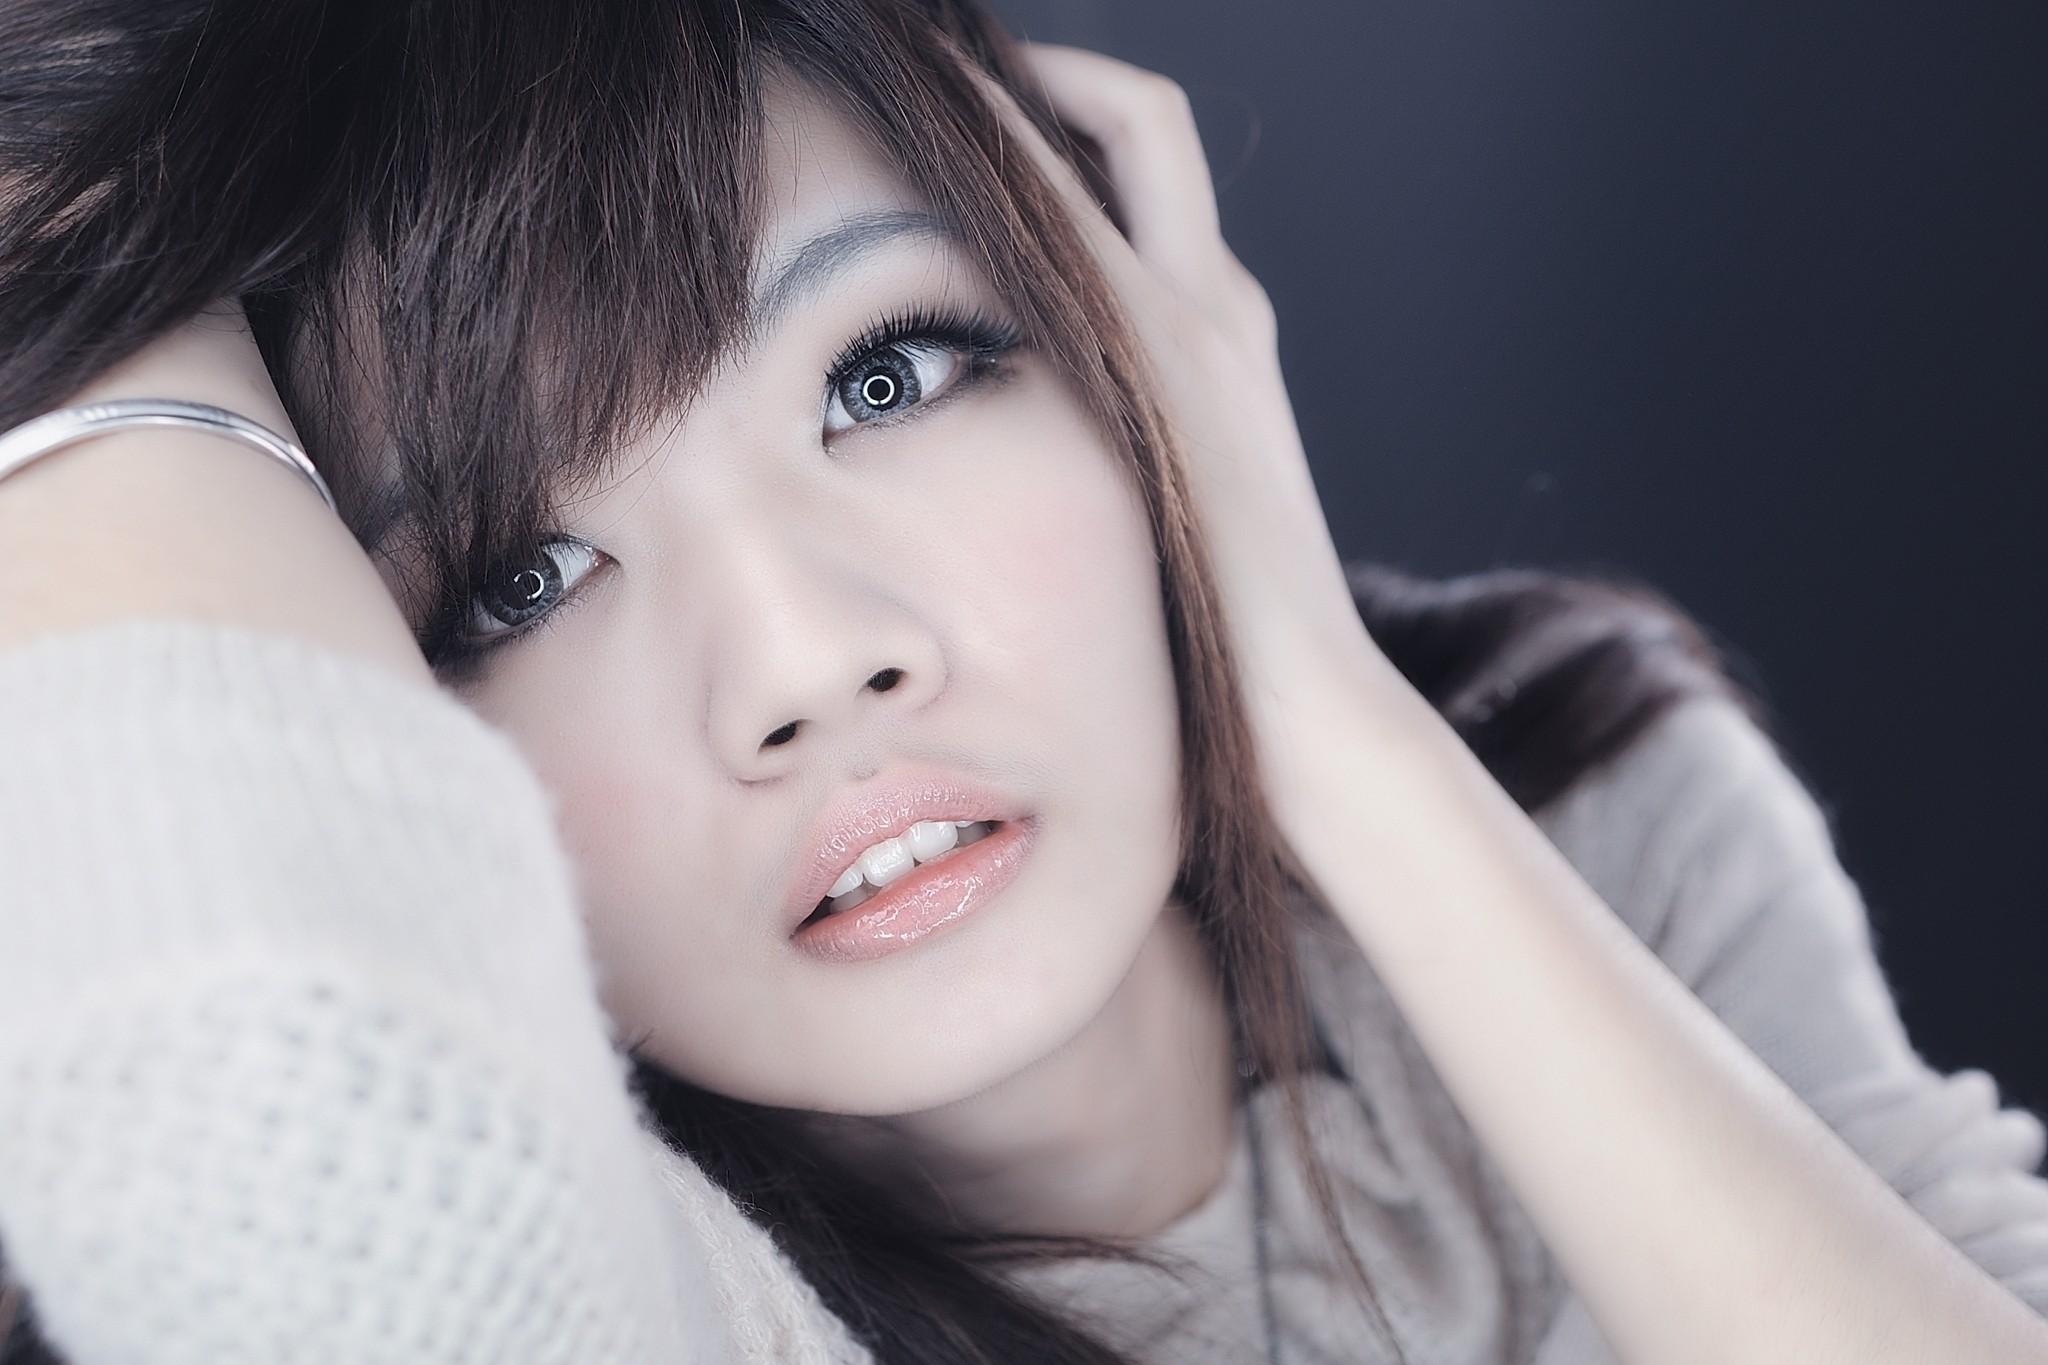 лицо, фото манипуляции, девушка, Азия, брюнетка